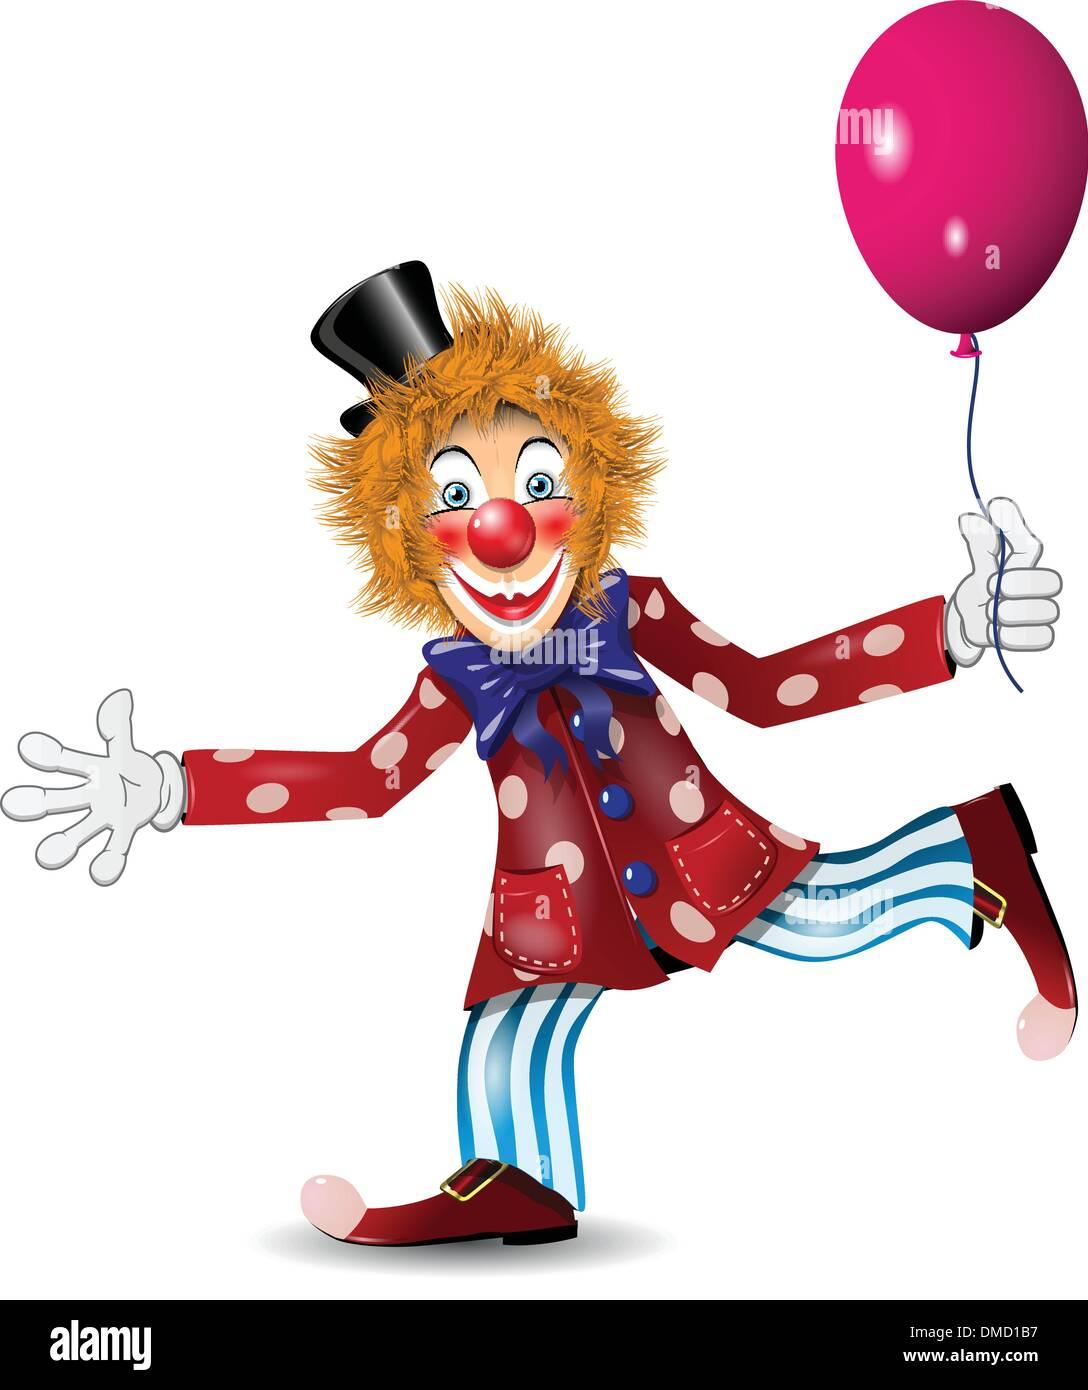 cheerful clown - Stock Image